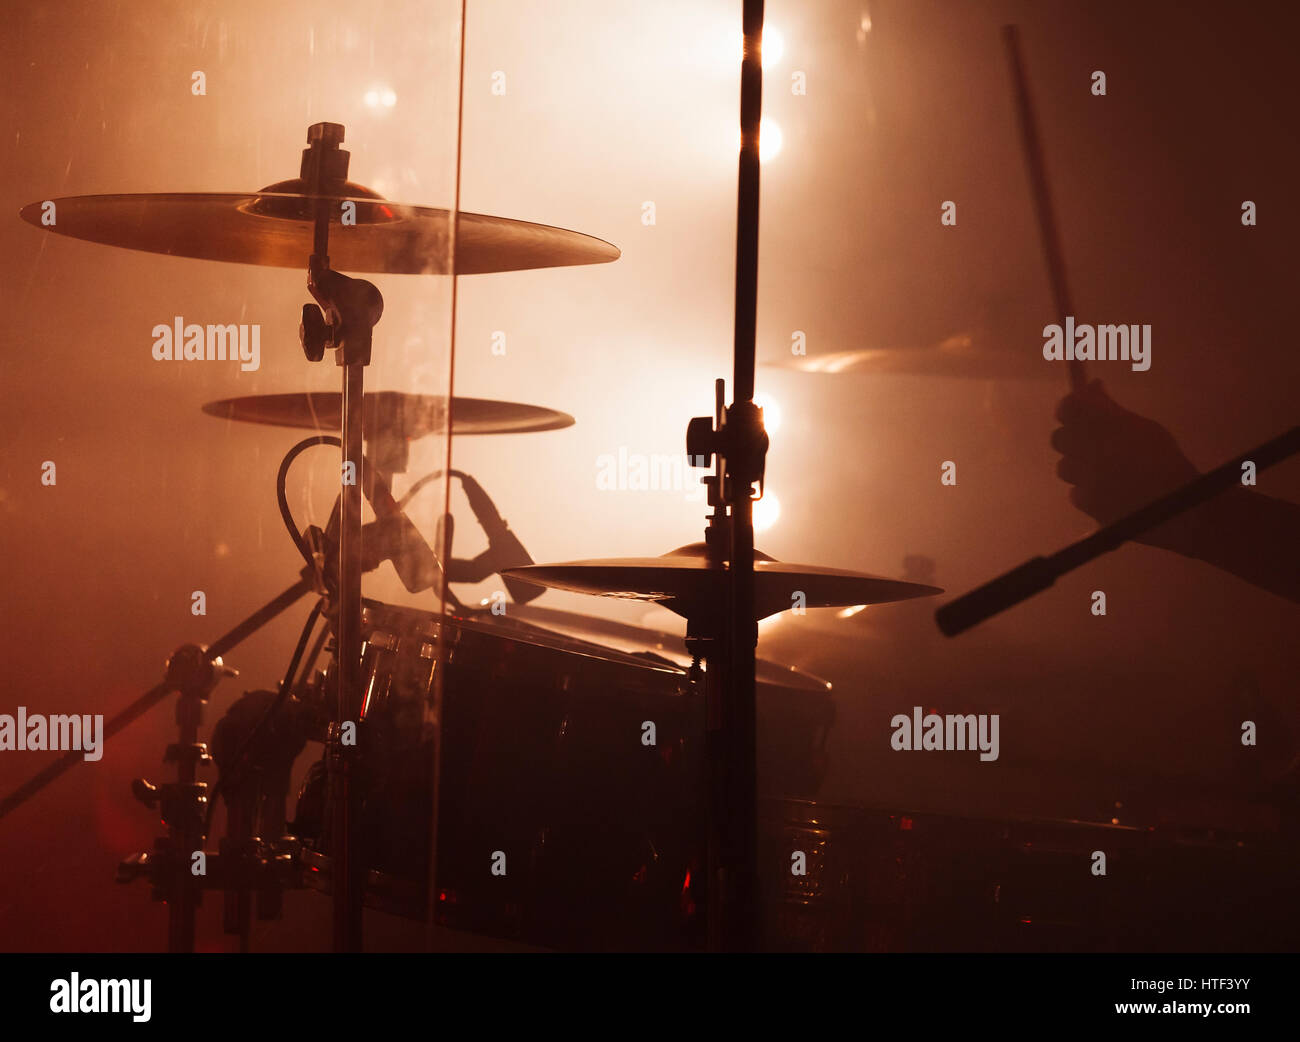 C8 Alamy Com Comp Htf3yy Live Music Photo Backgrou